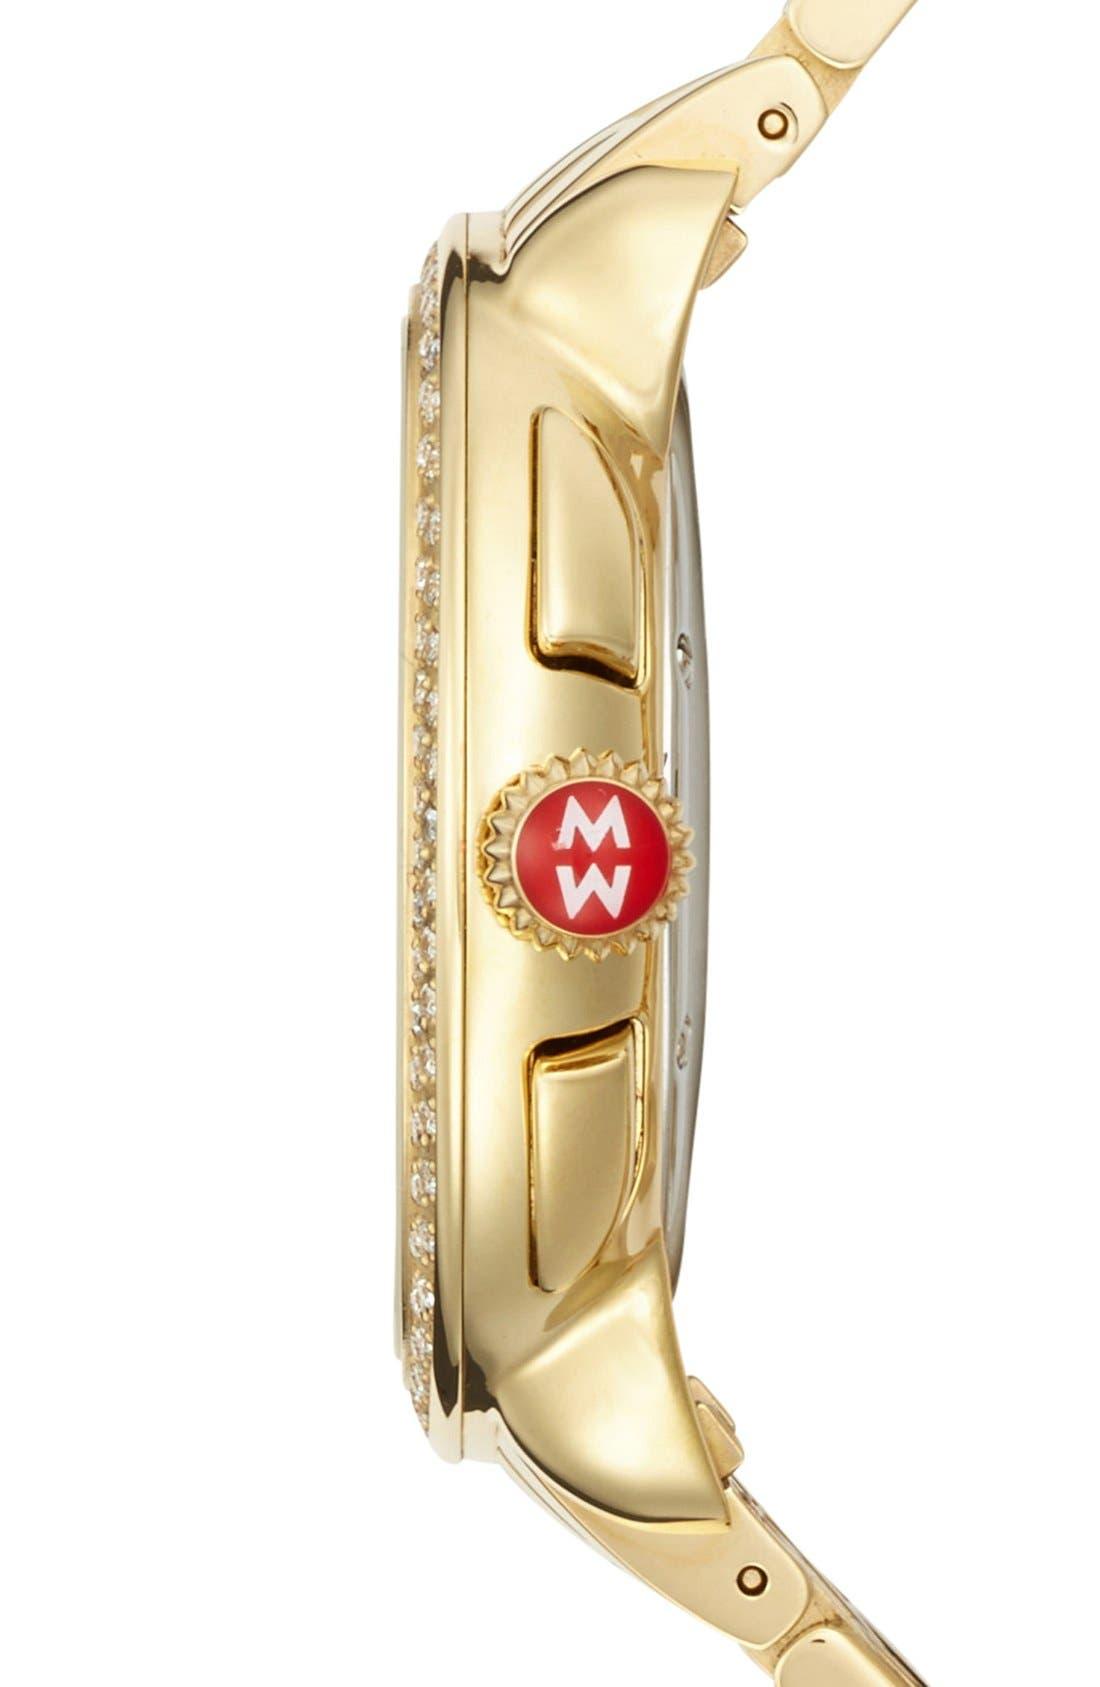 'Serein' 18mm Watch Bracelet Band,                             Alternate thumbnail 6, color,                             GOLD